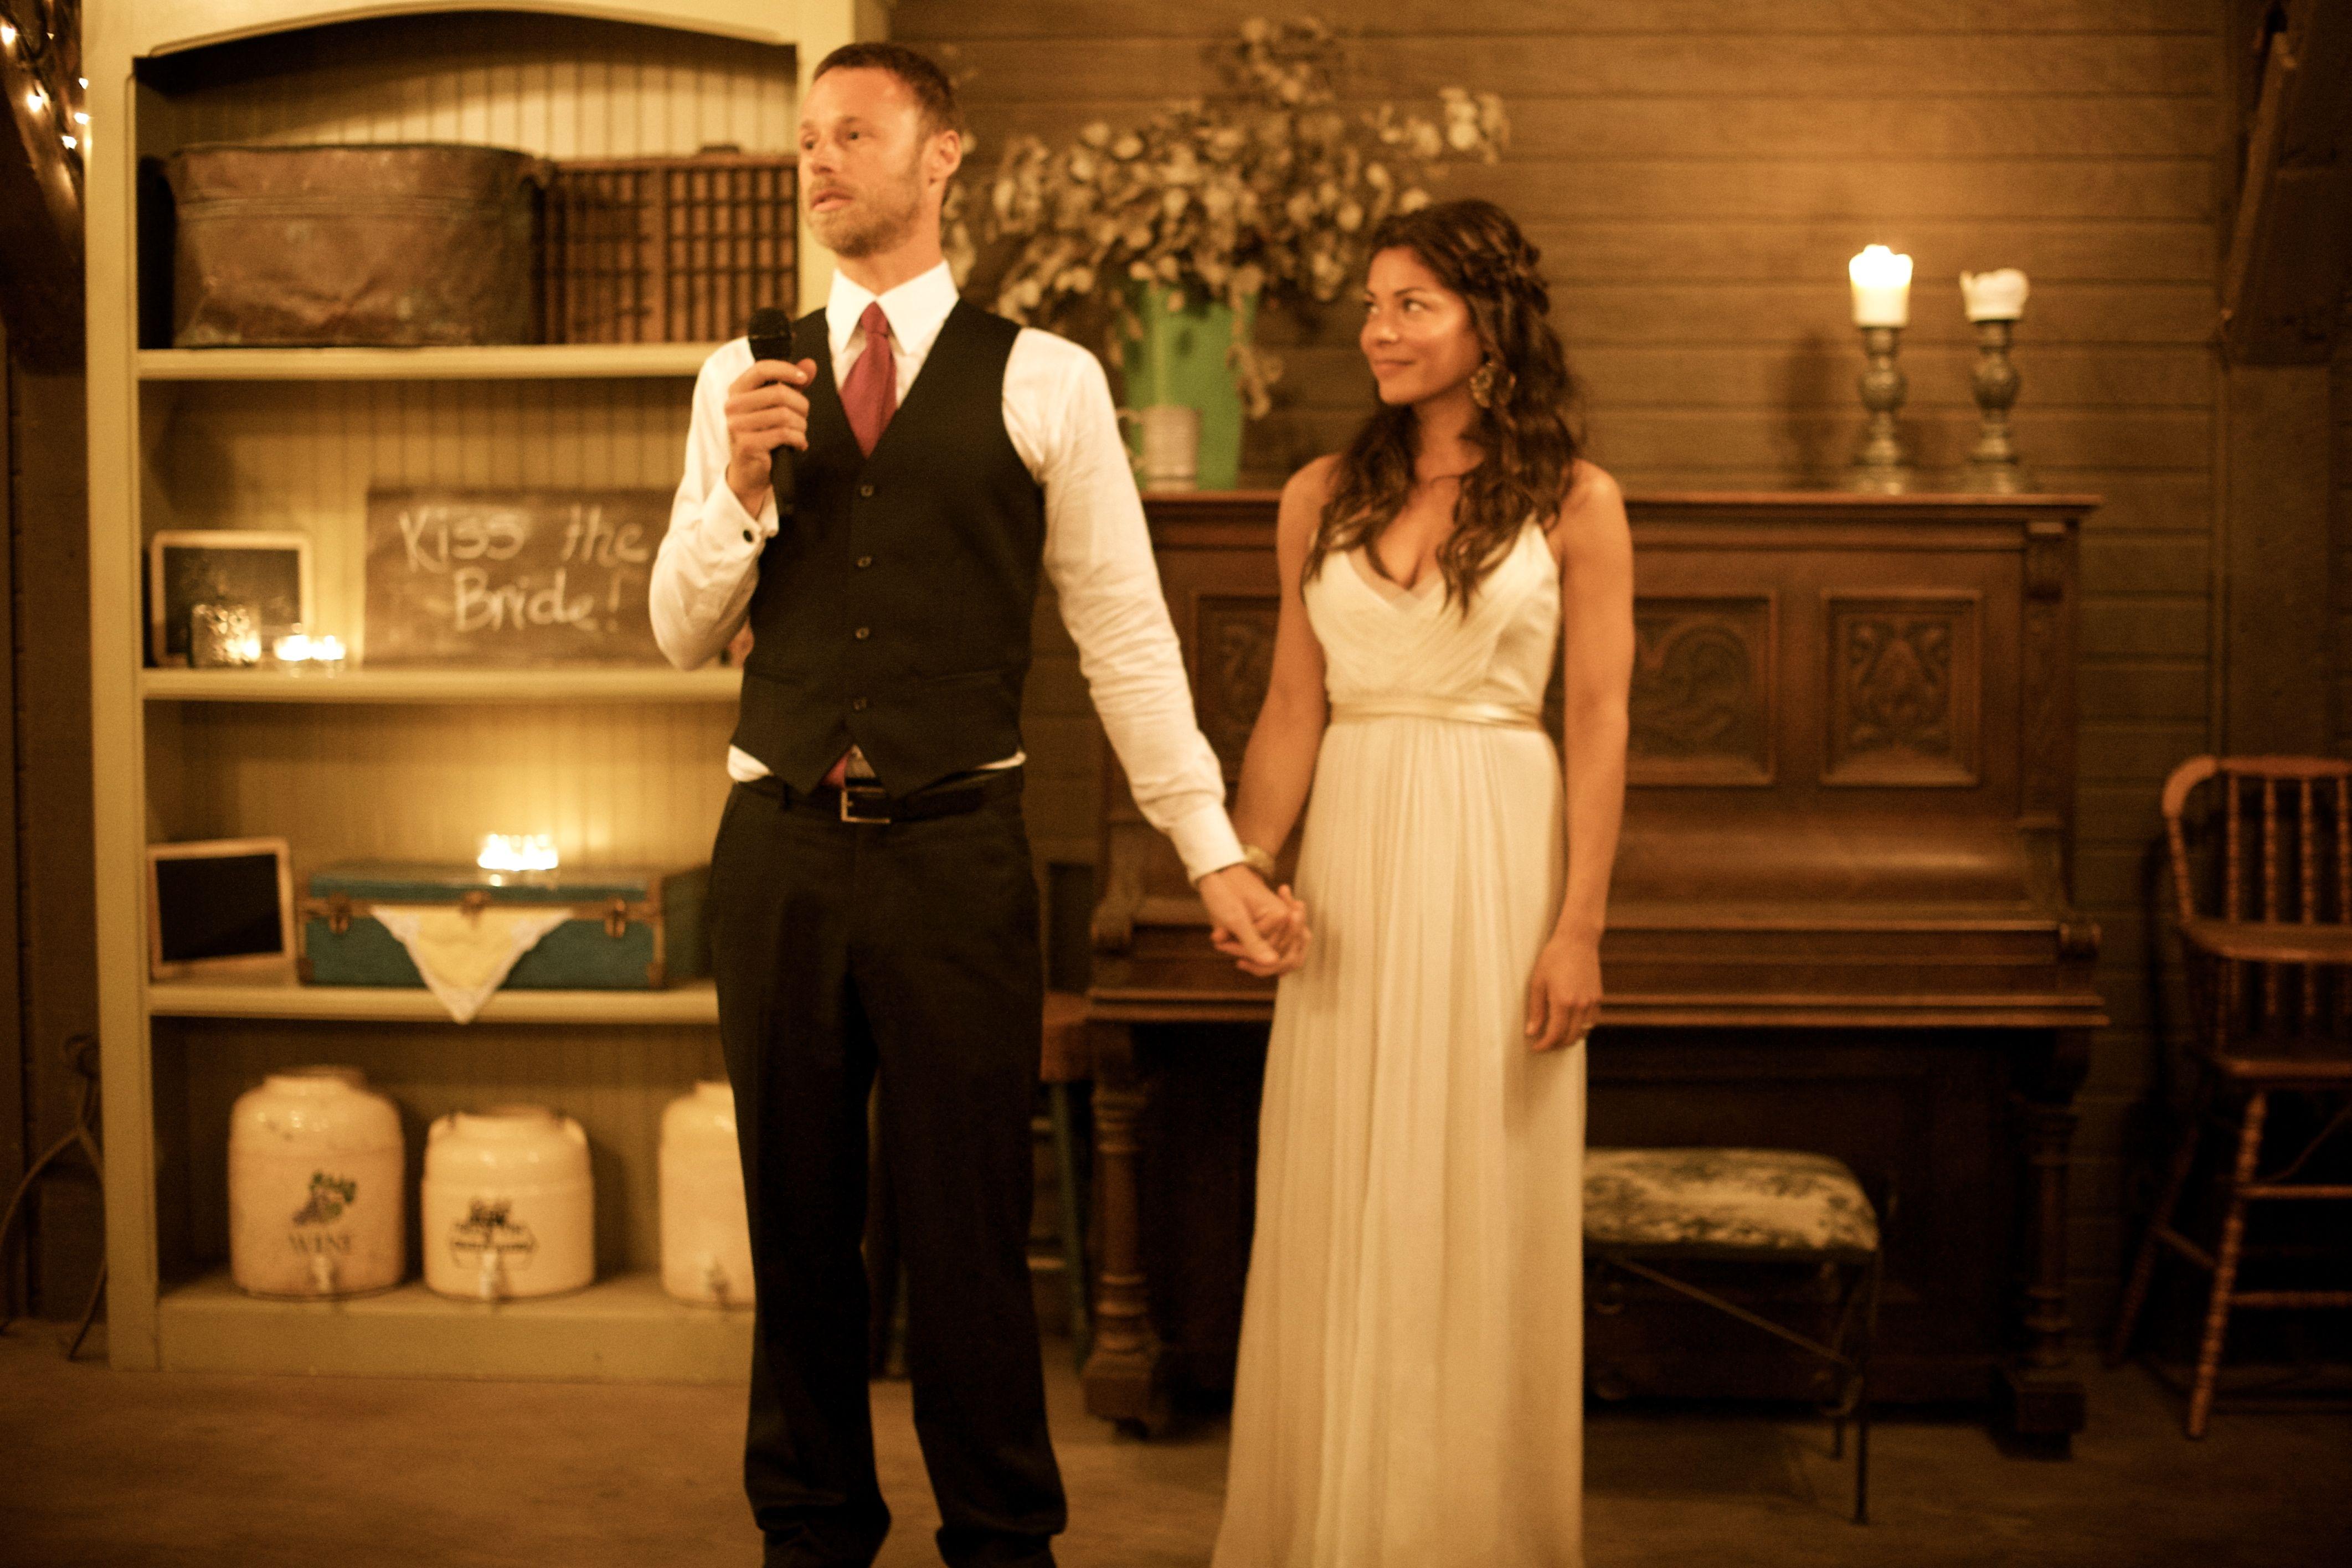 Hb effortless and simply stunning wedding dress wedding dress